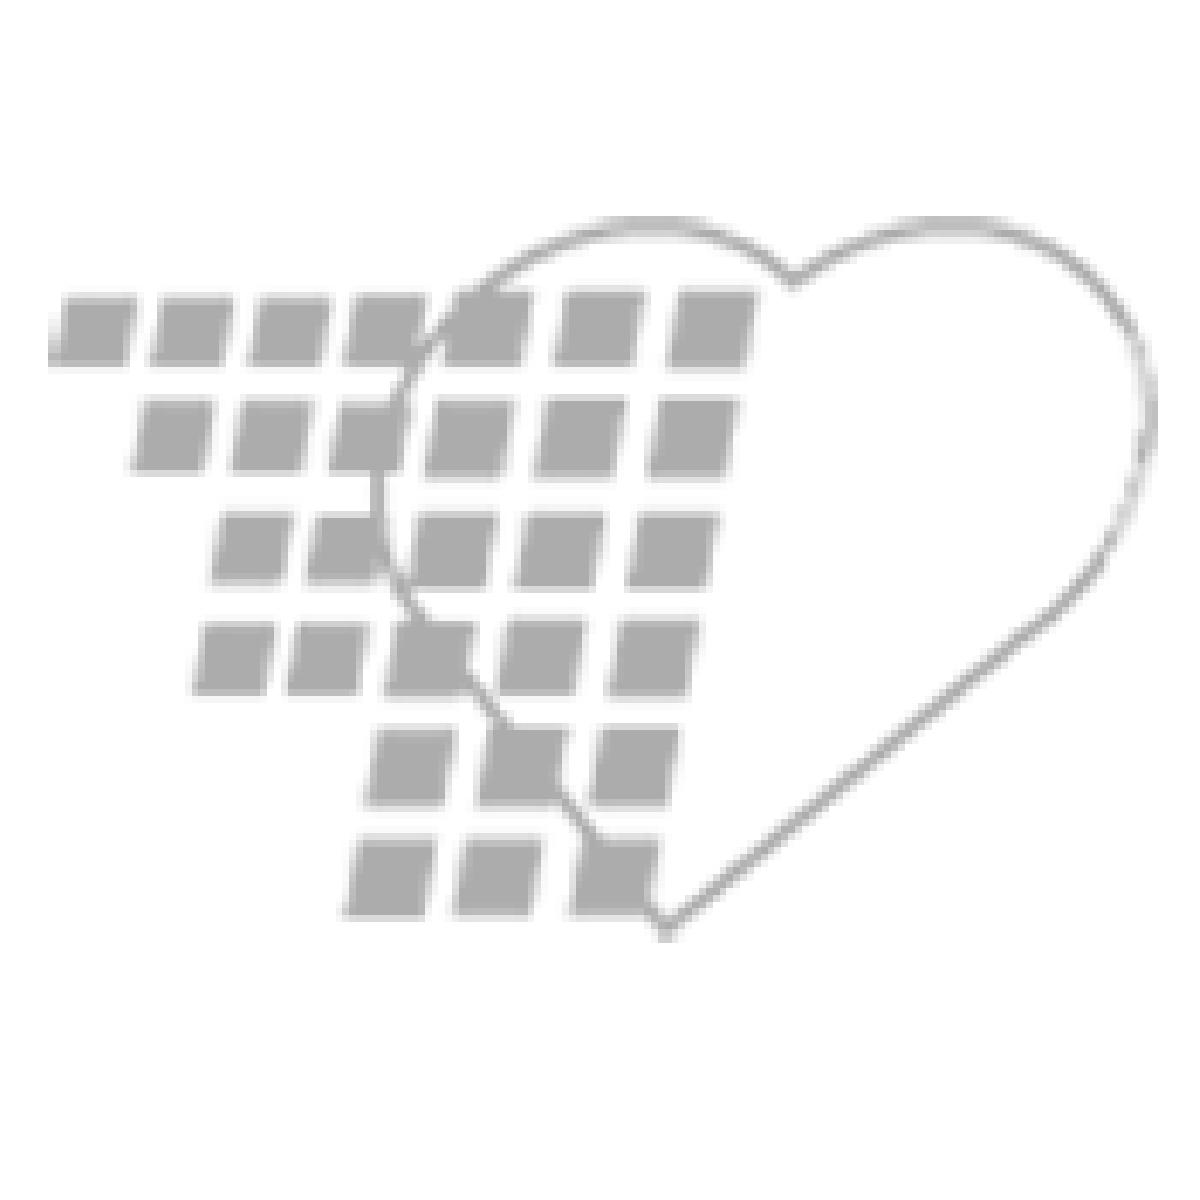 06-93-1109 - Demo Dose® 50% Dextros 50mL Simulated Code Drug